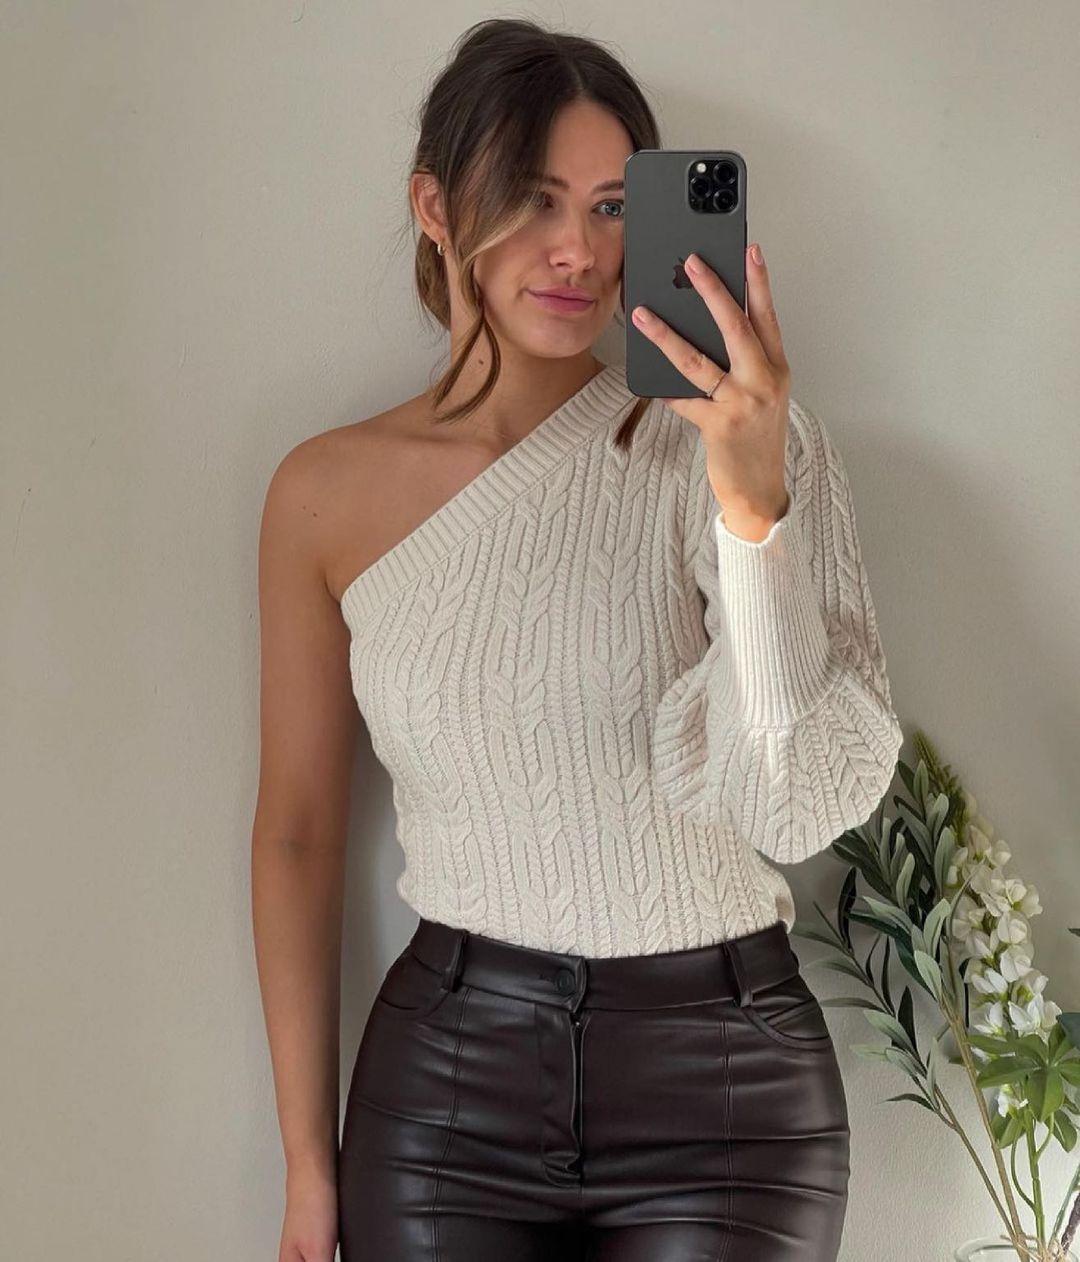 asymmetric knit sweater de Zara sur zara.style.daily